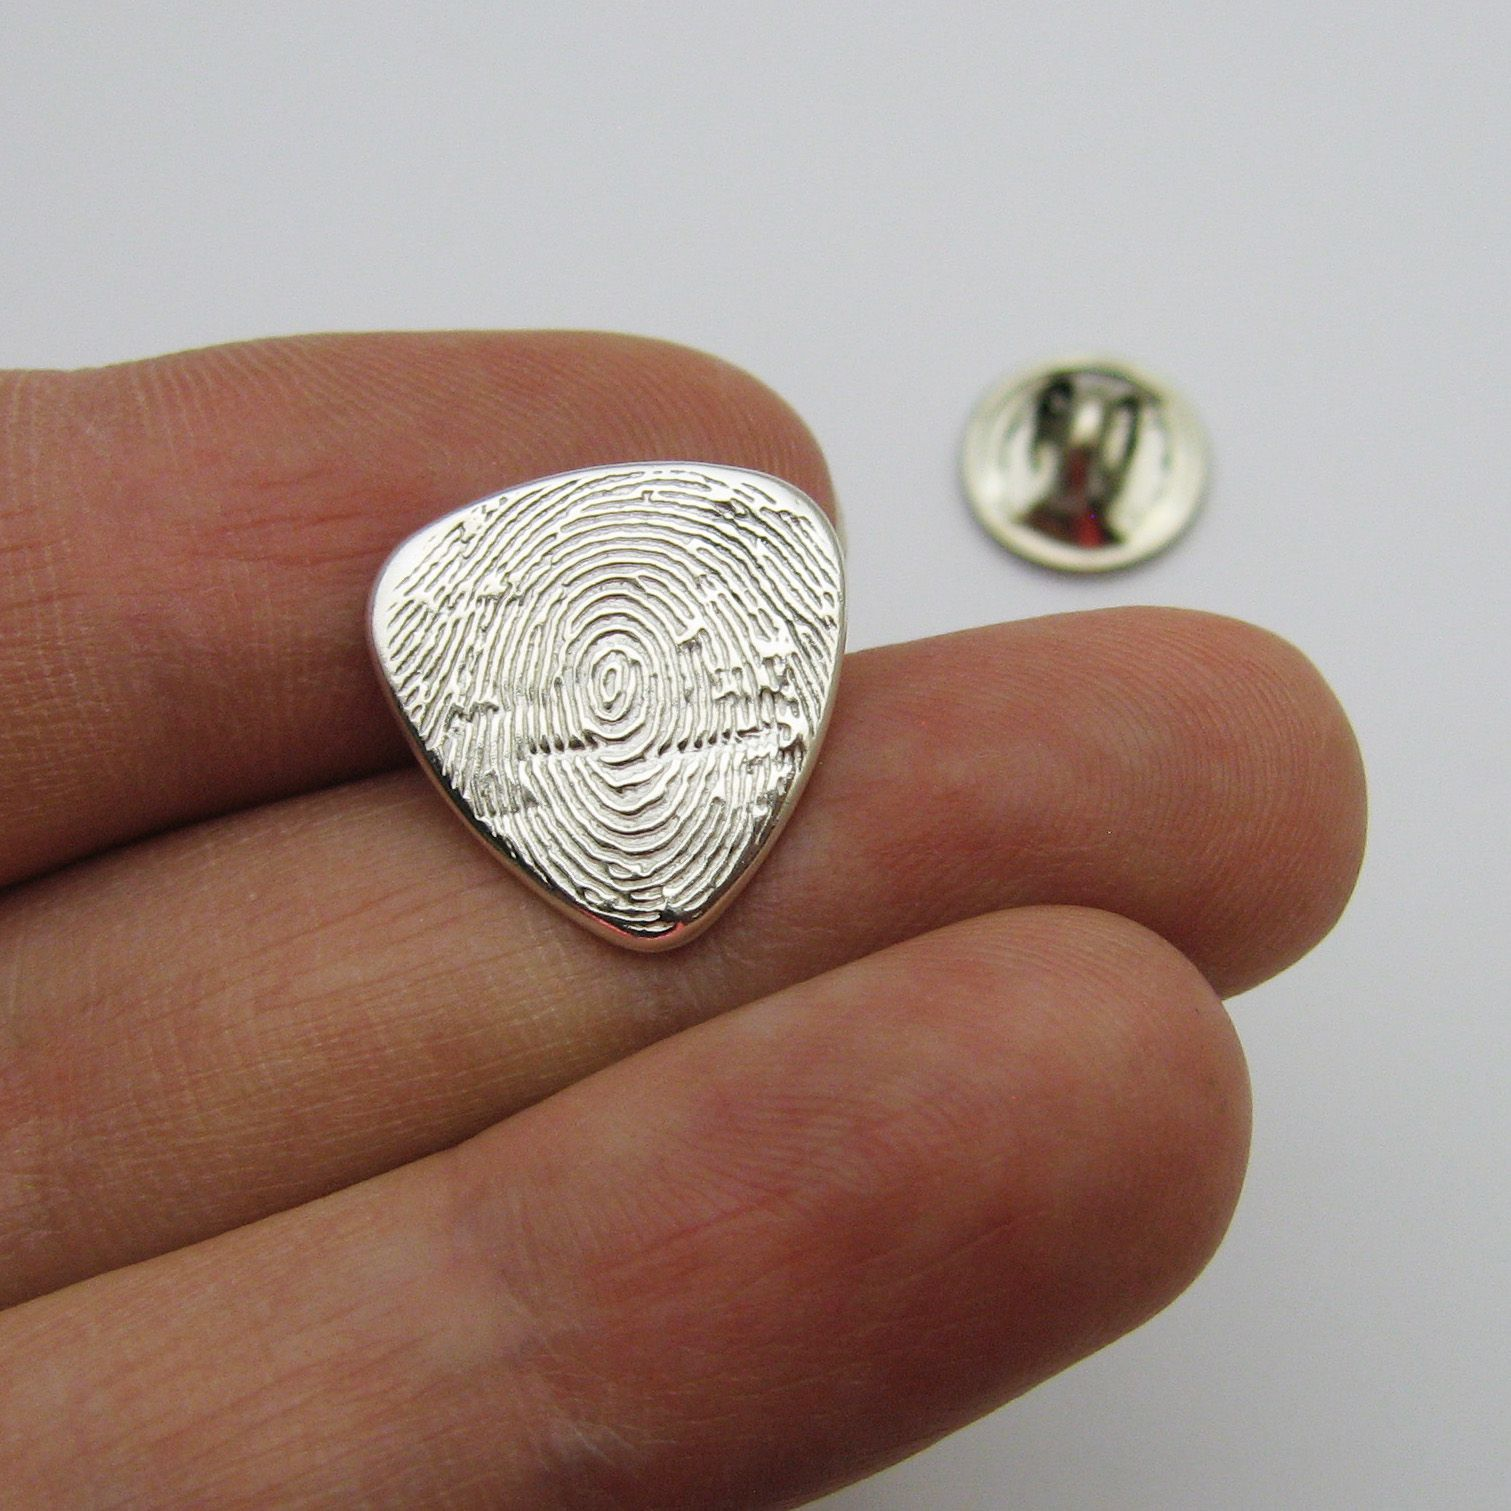 Unique Buy a Hand Crafted Fingerprint Guitar Pick Lapel Pin Or Tie Tack  MZ09